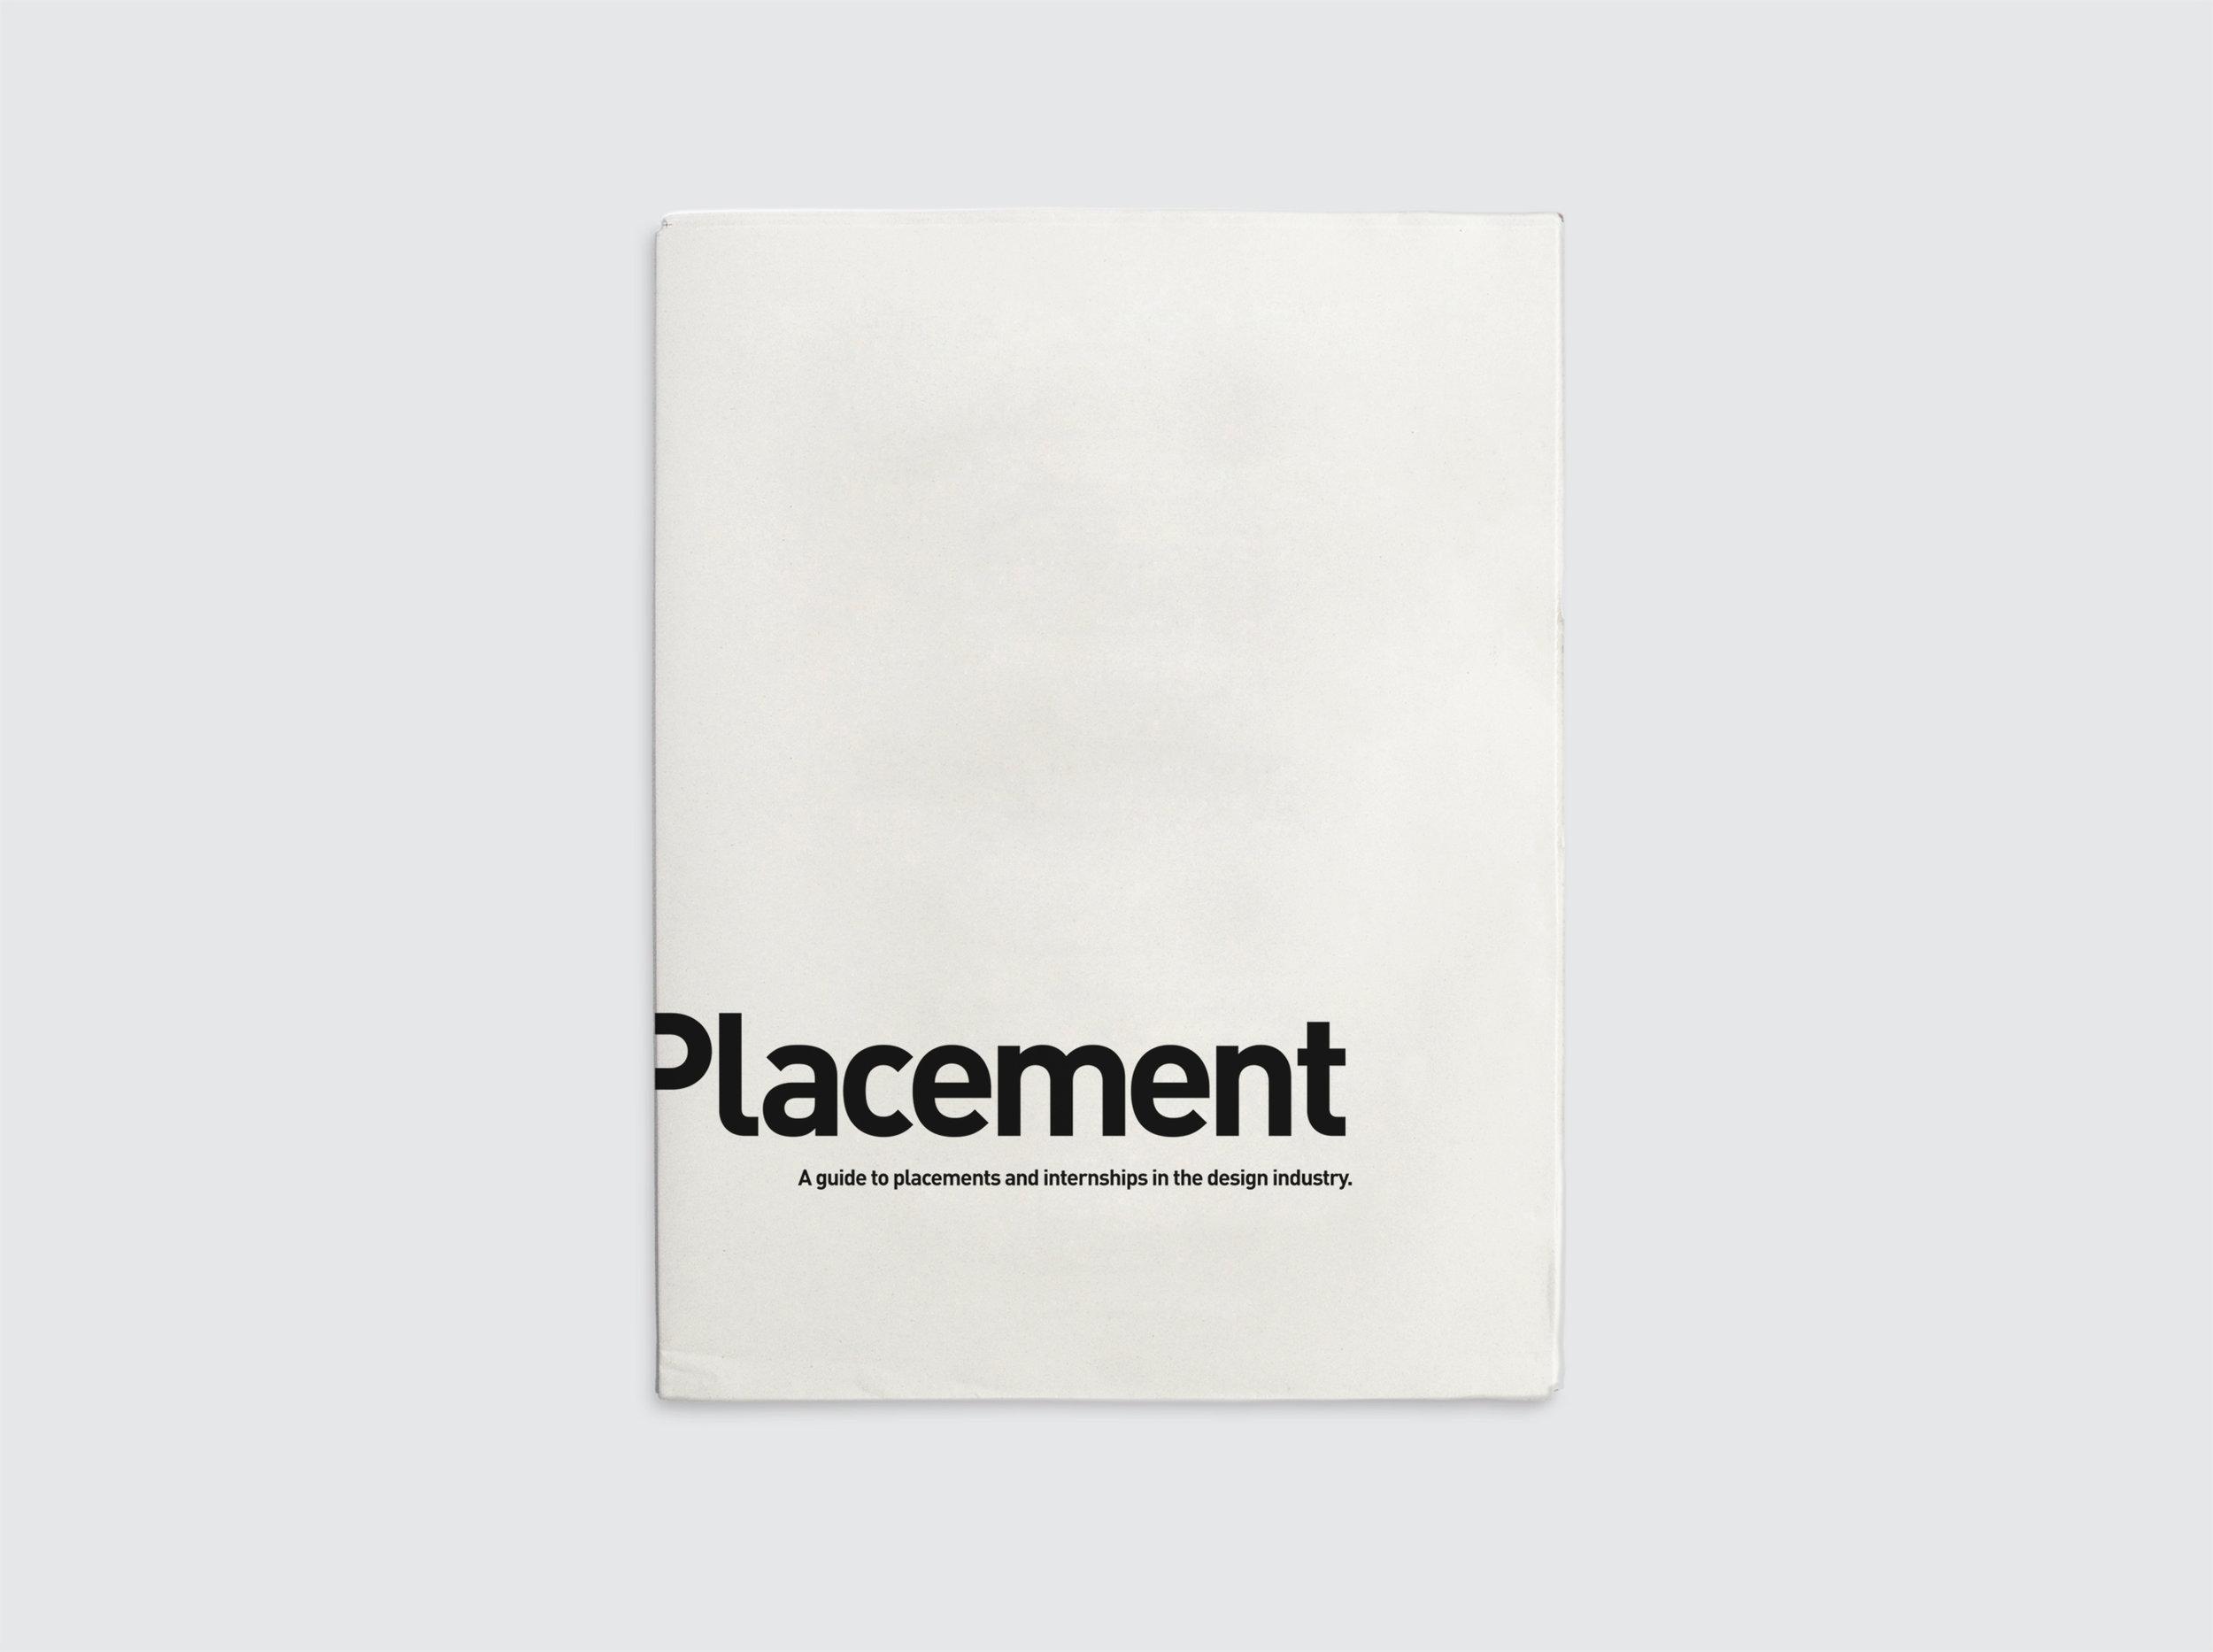 MattJohnson_Placement1.jpg